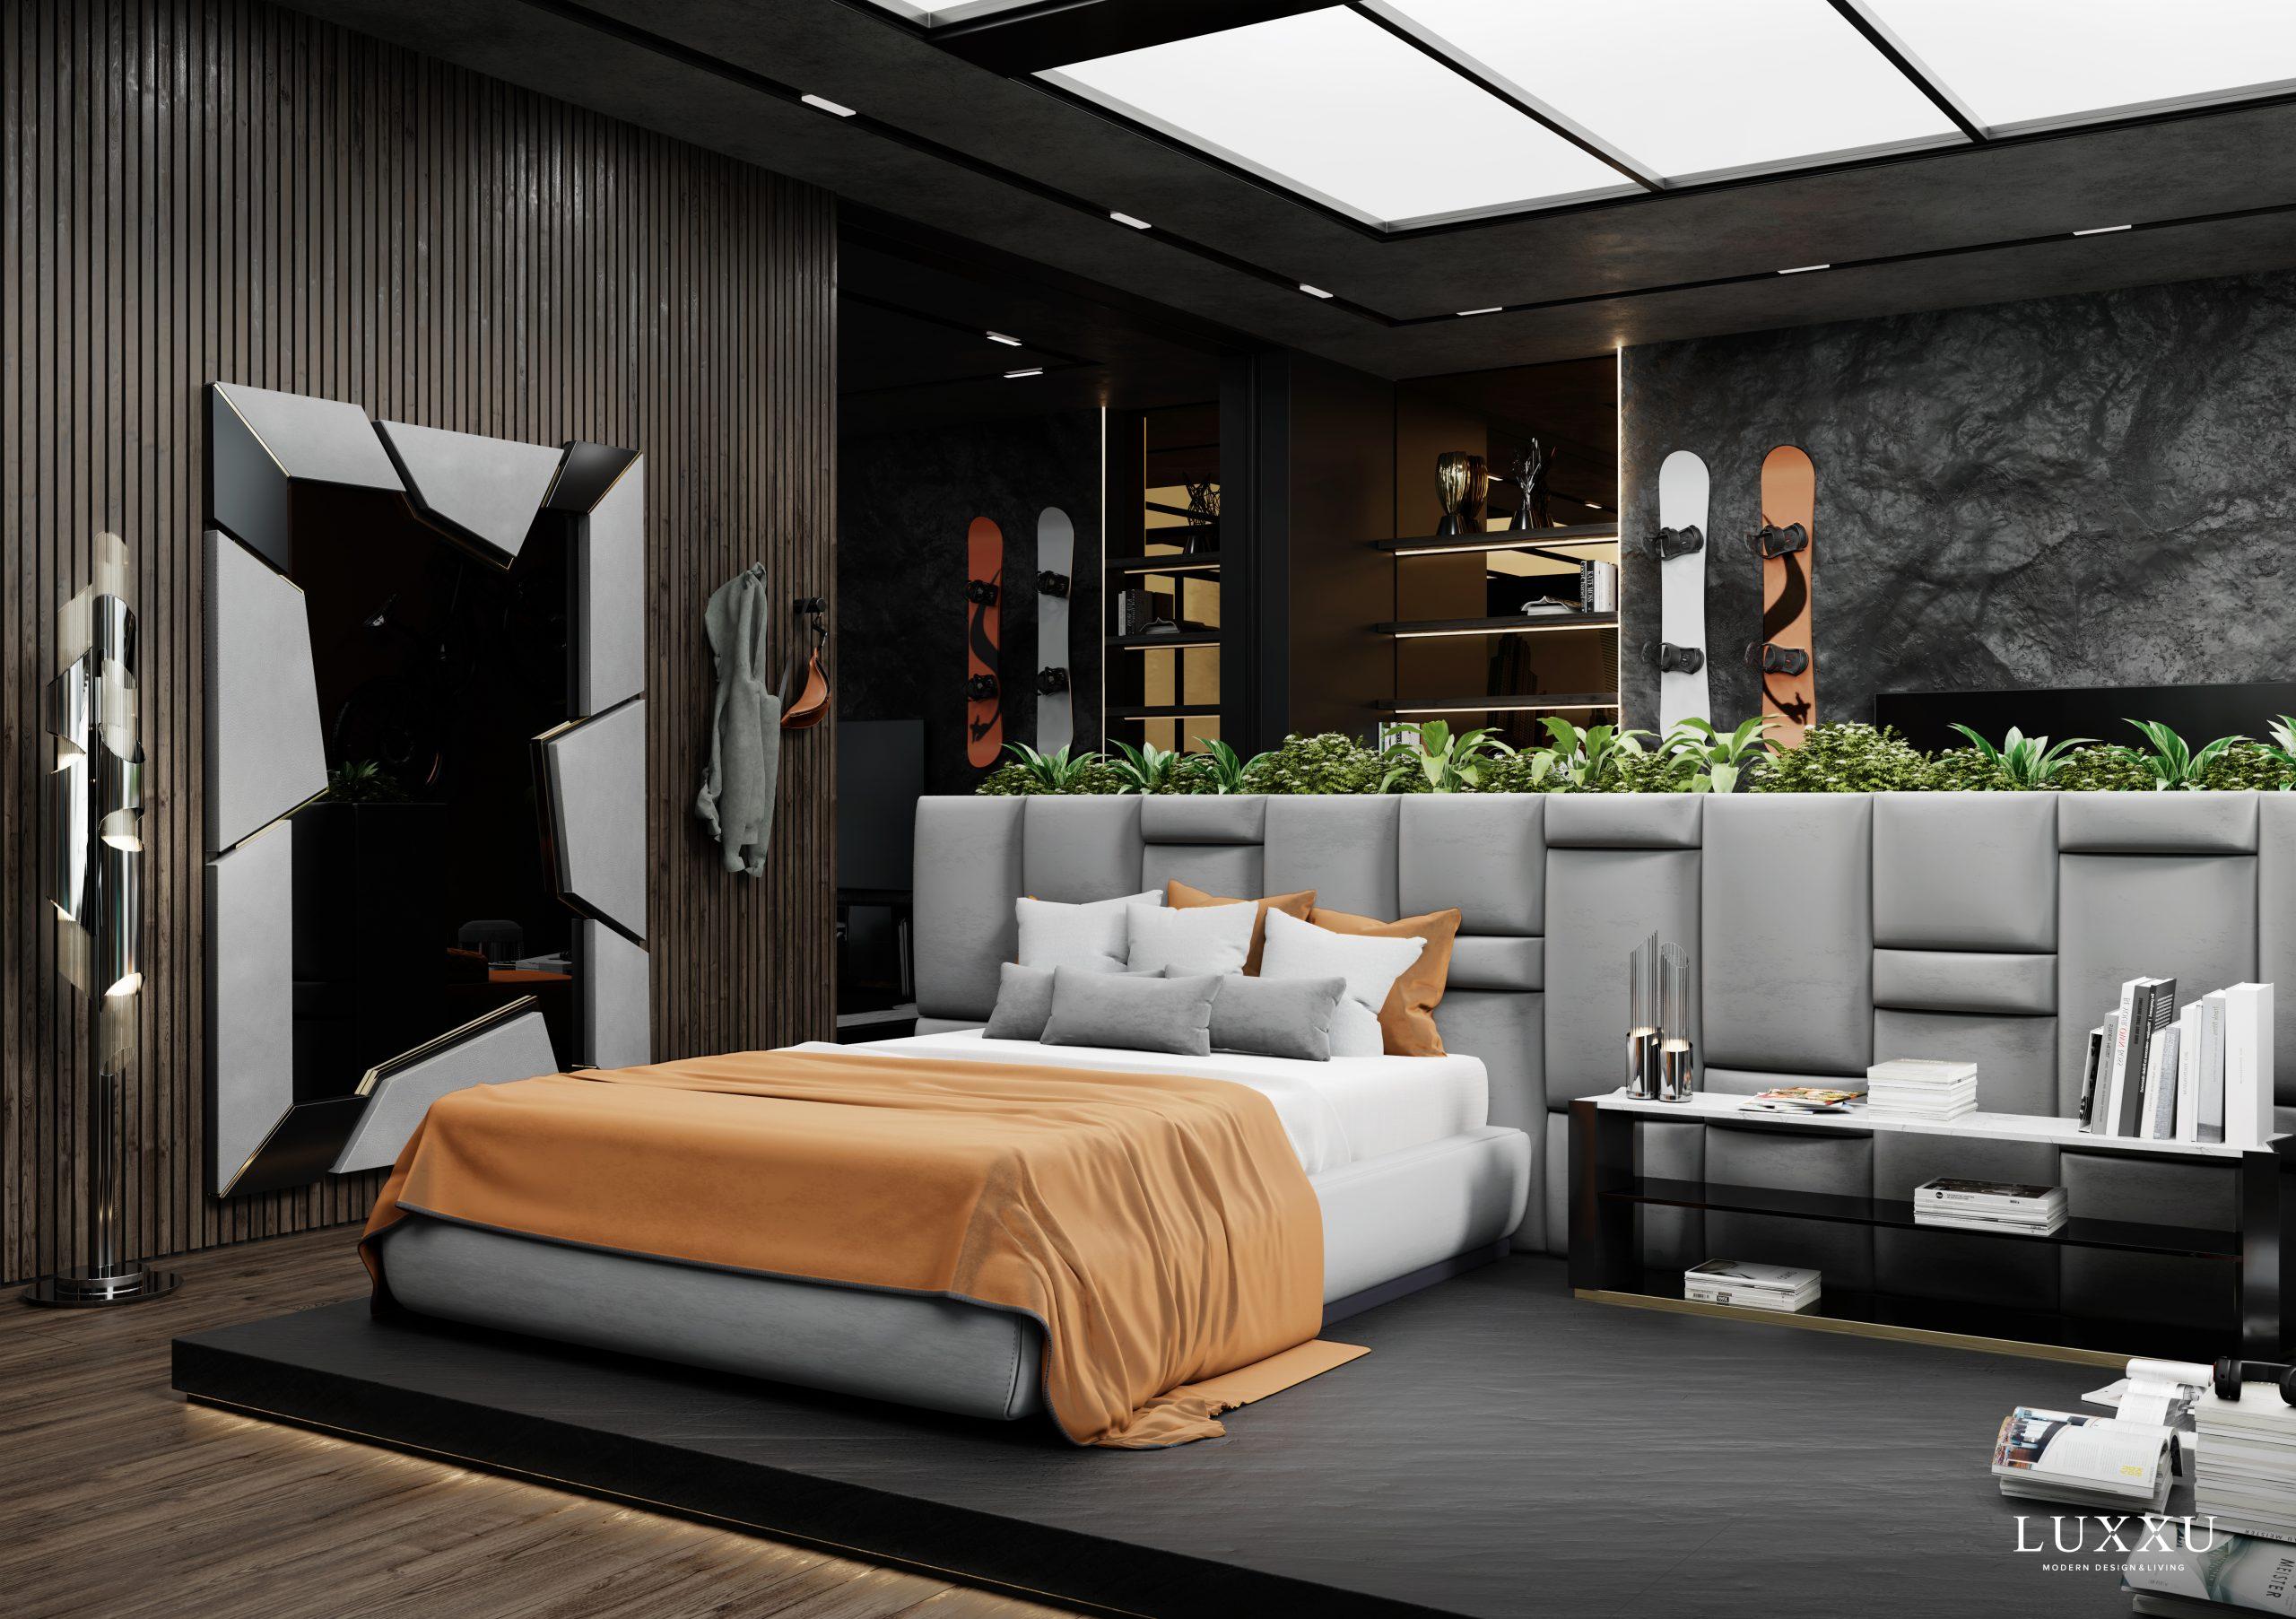 Bedroom Ambiences with Luxury Design Brands